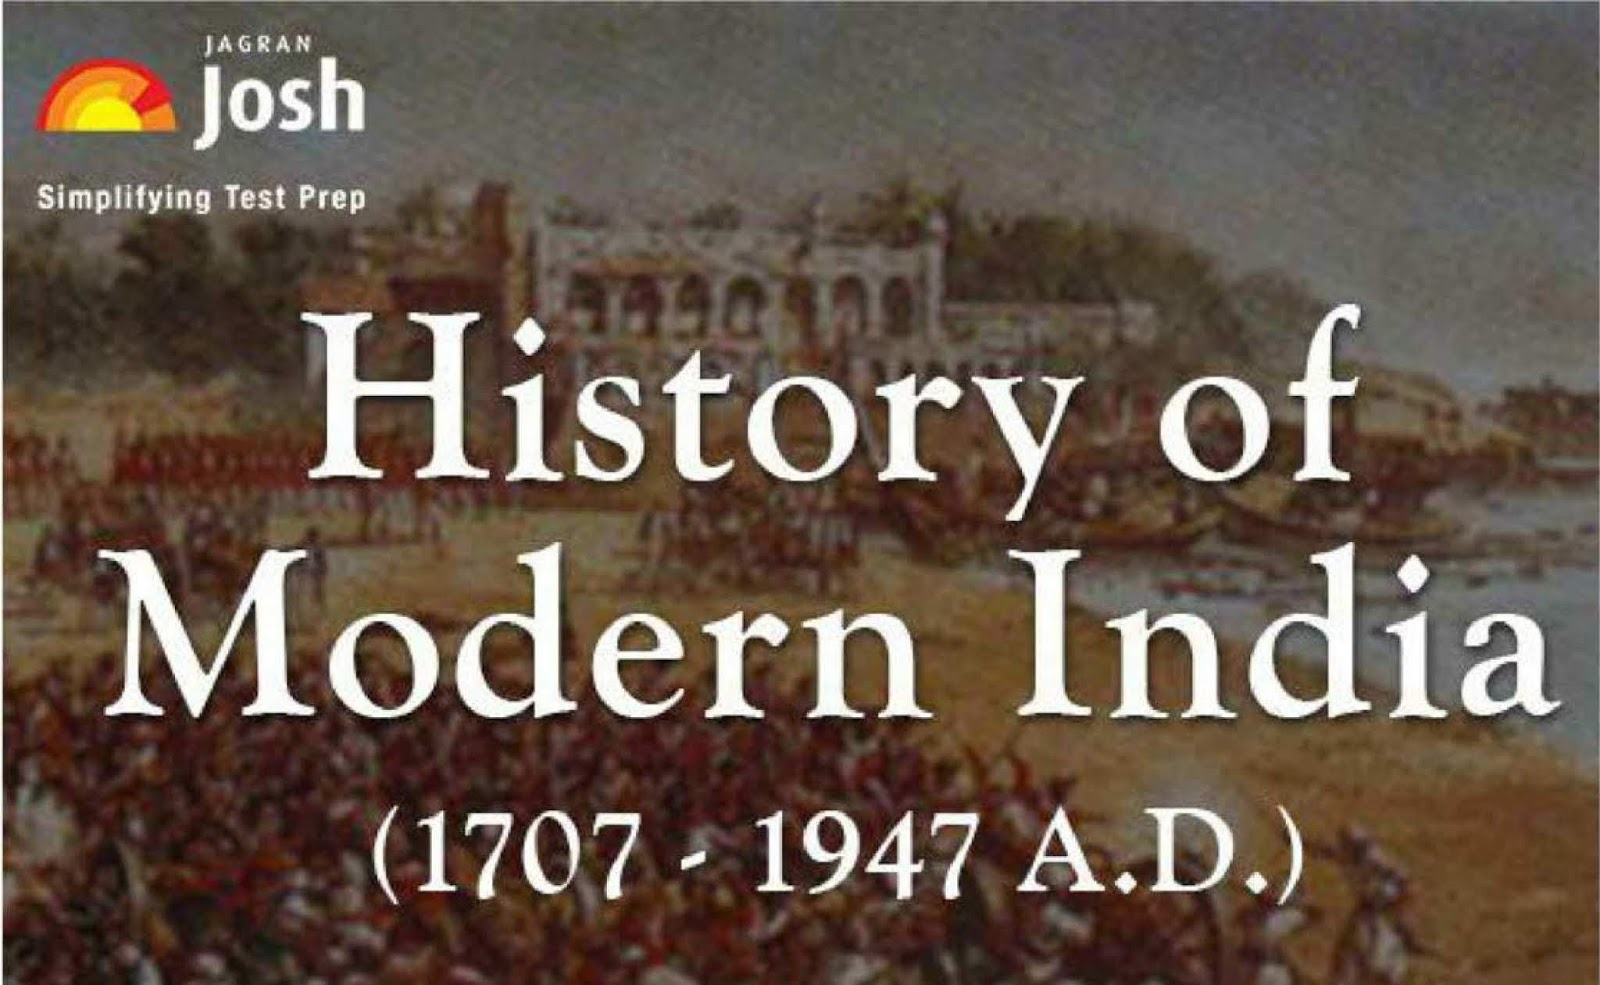 history-of-modern-india-by-jagran-josh